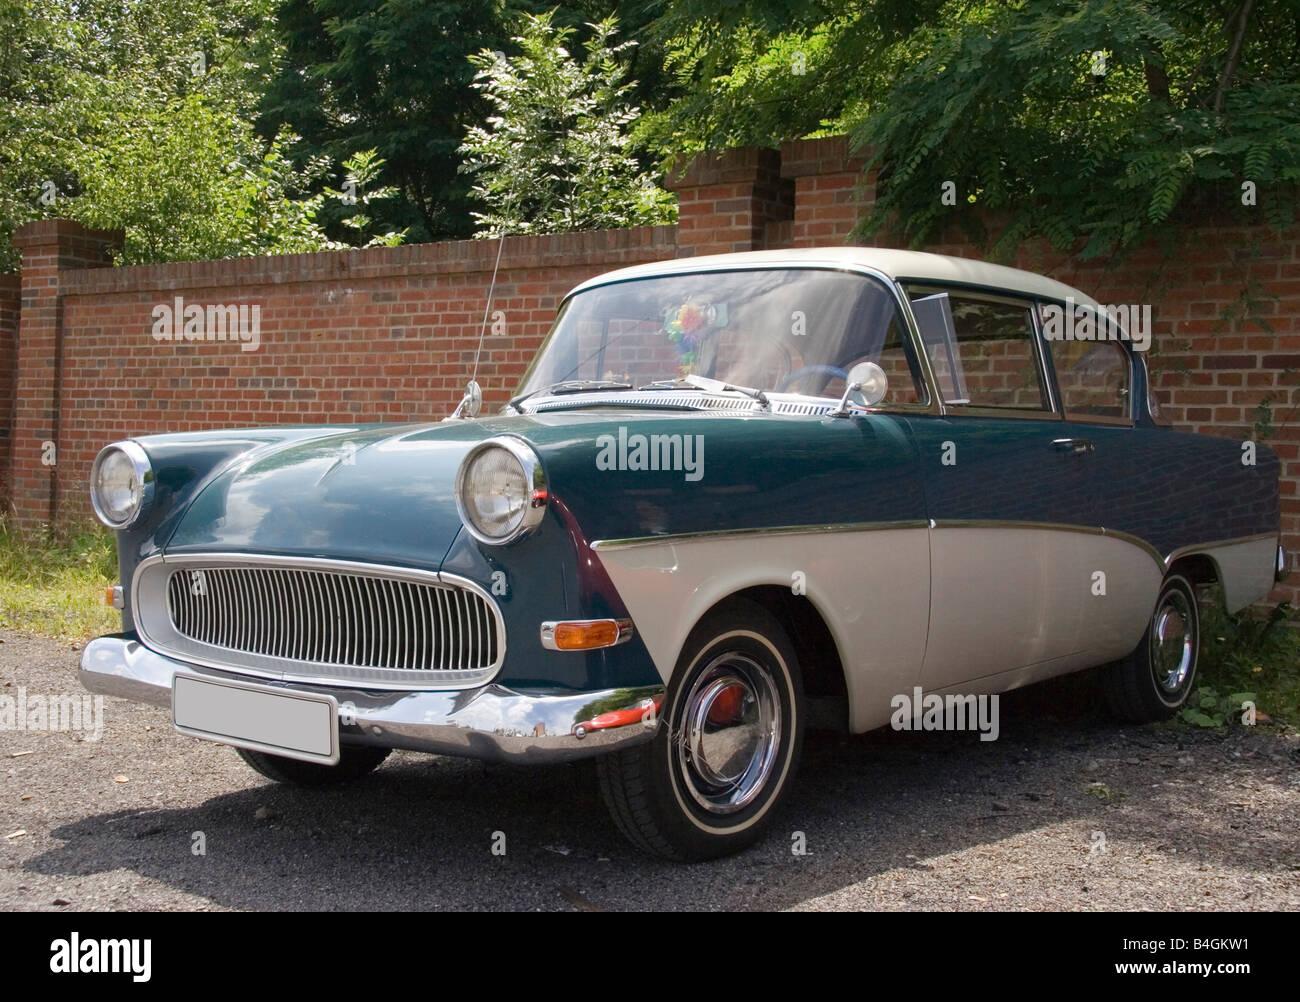 Rare Vintage Opel Olympia German Car Classic Car Show Stock Photo